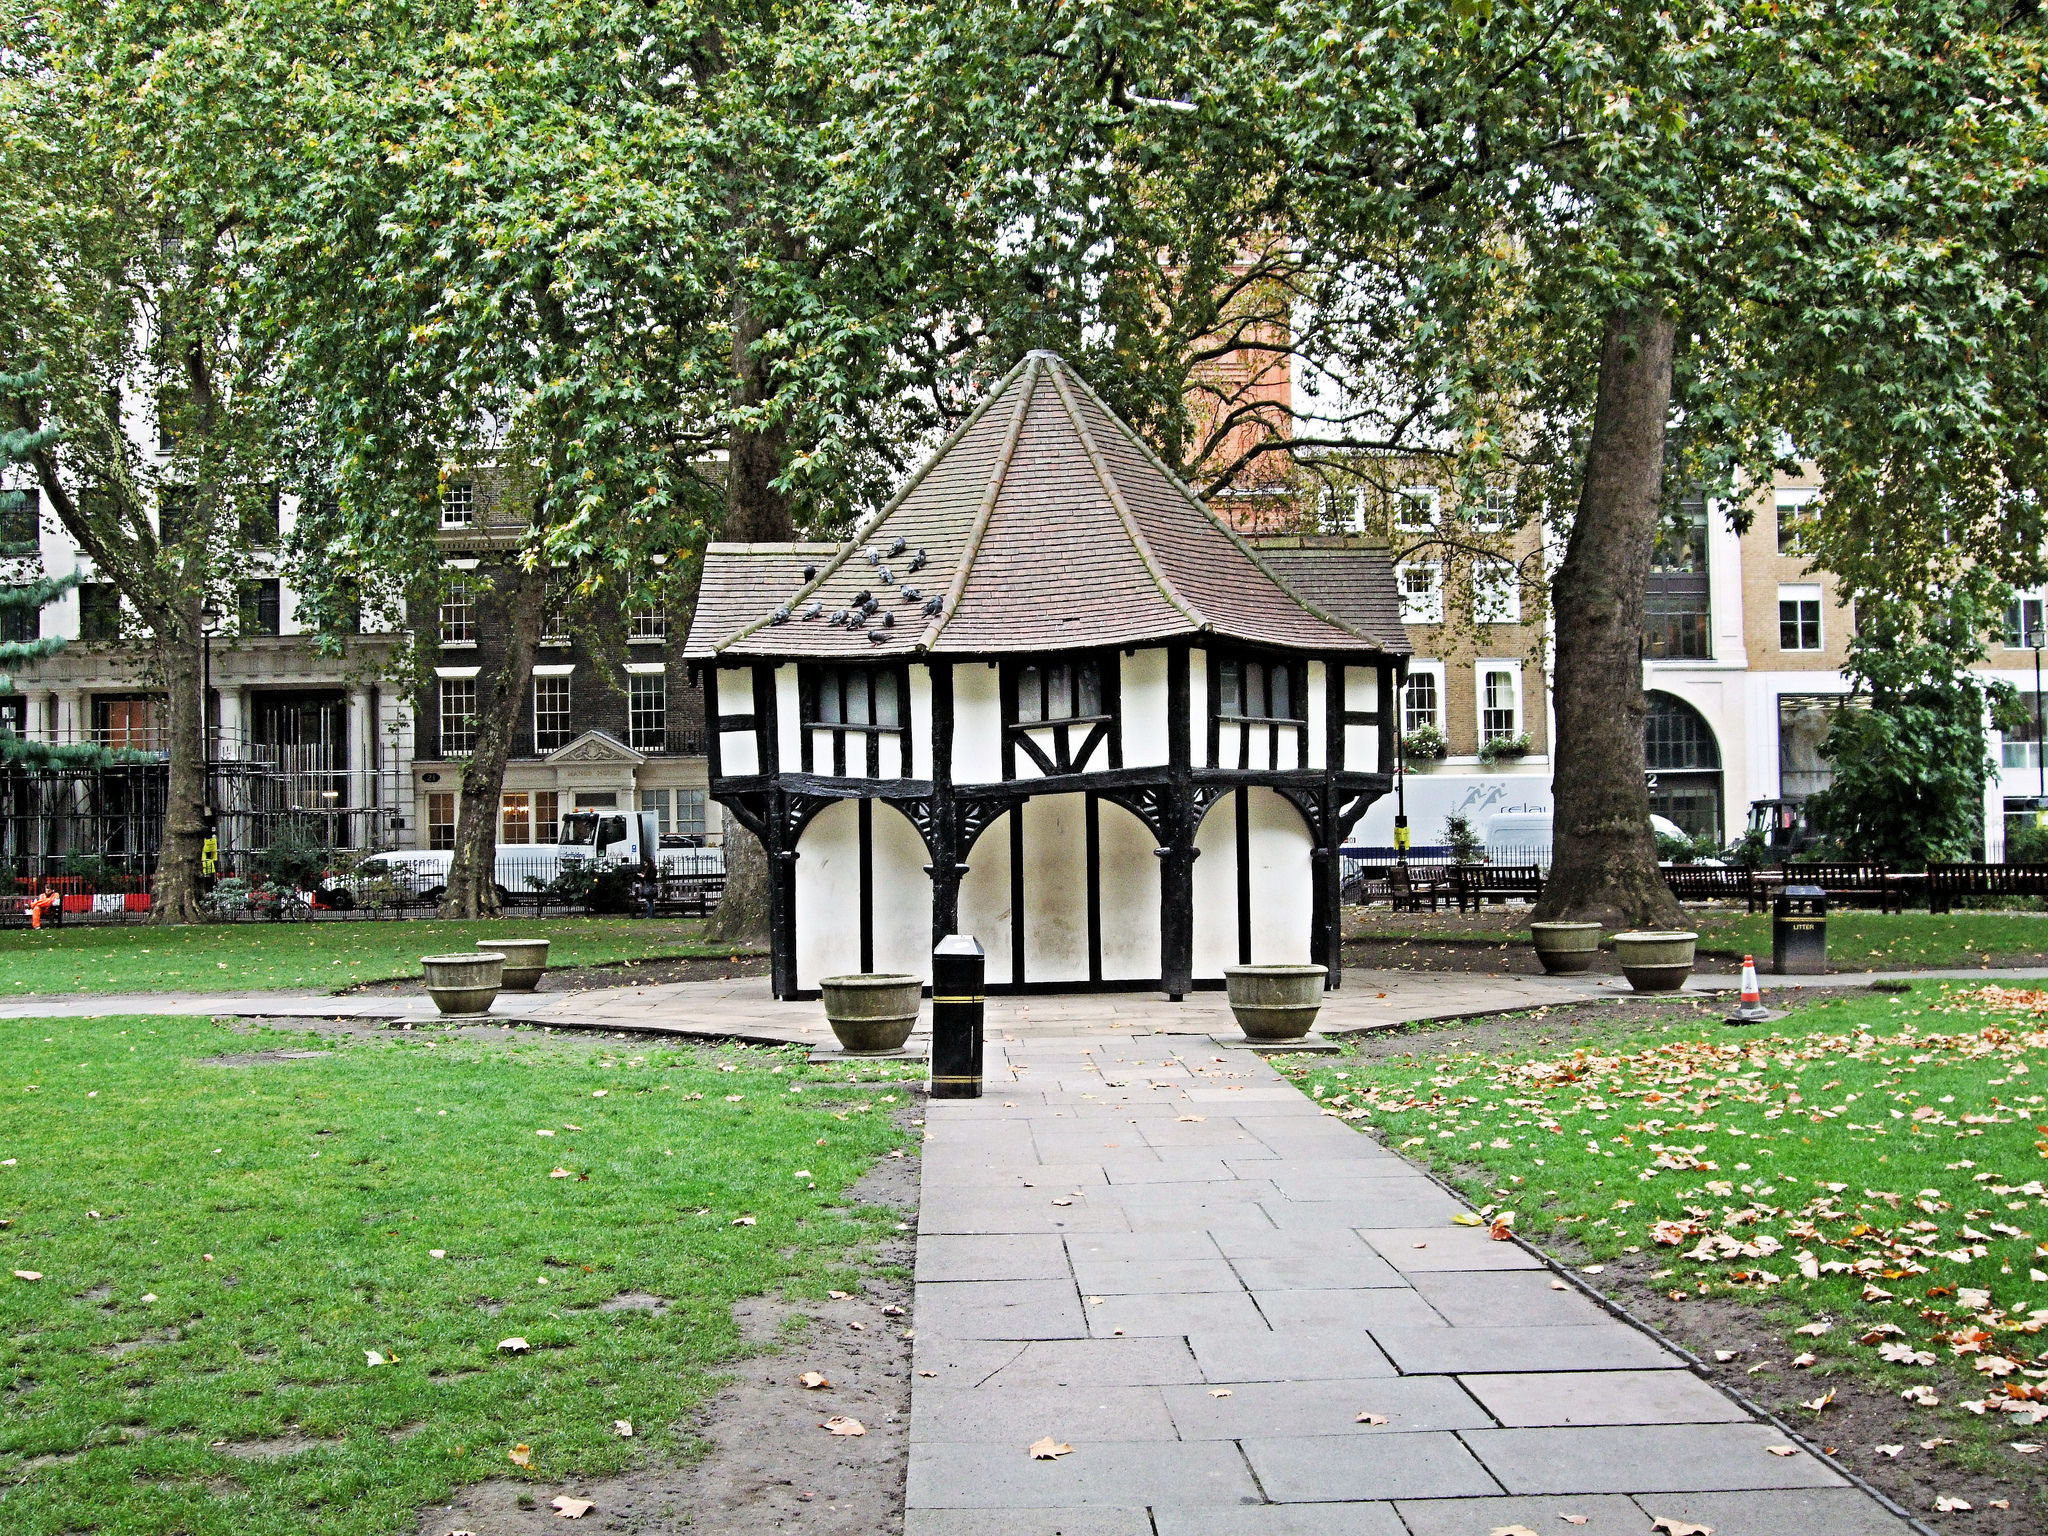 Soho Square cottage, London